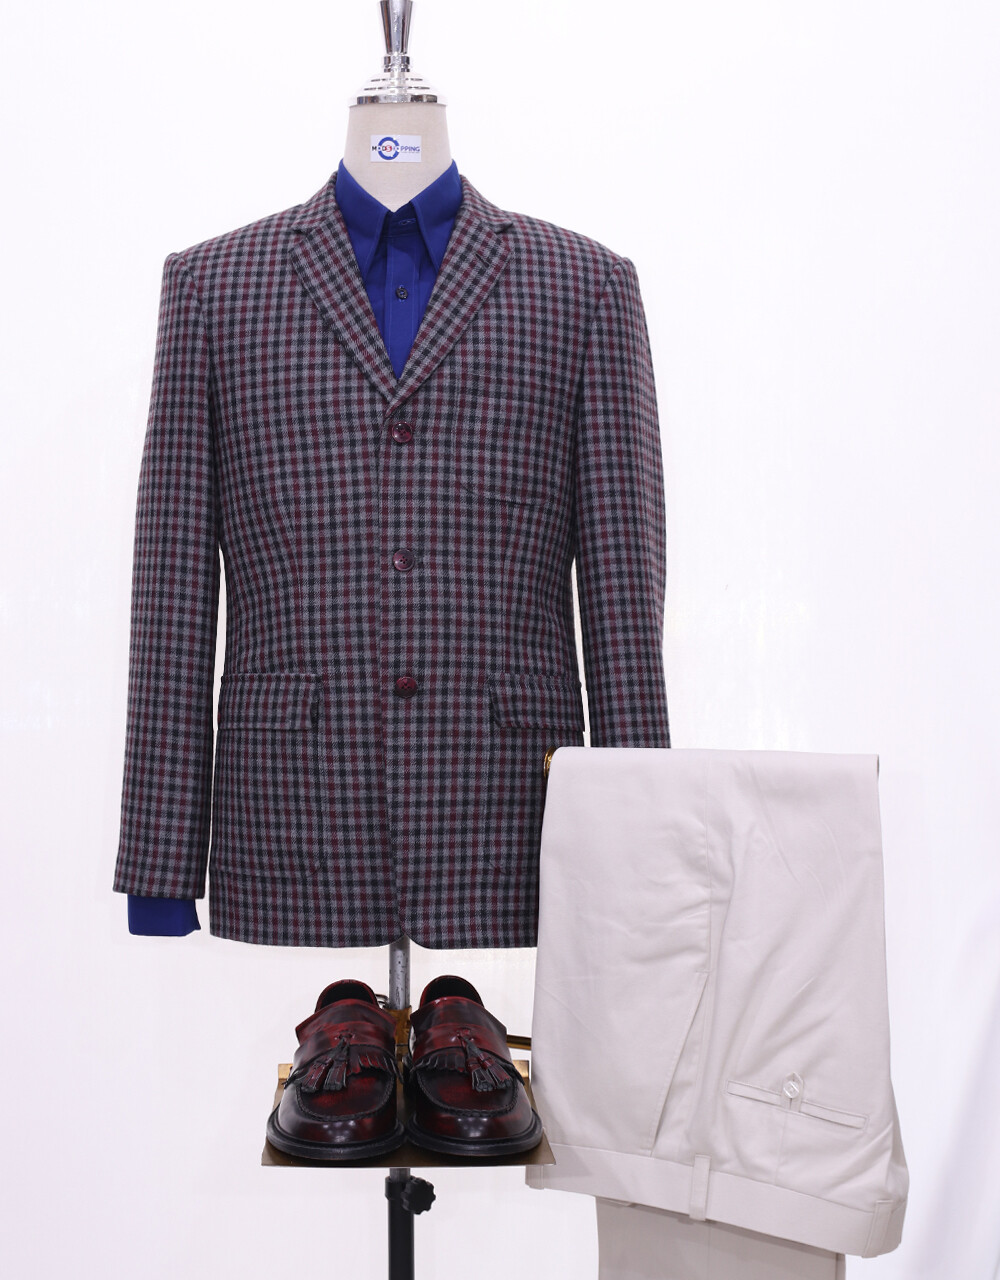 Tweed Jacket | Grey Gingham Check 60s Style Jacket